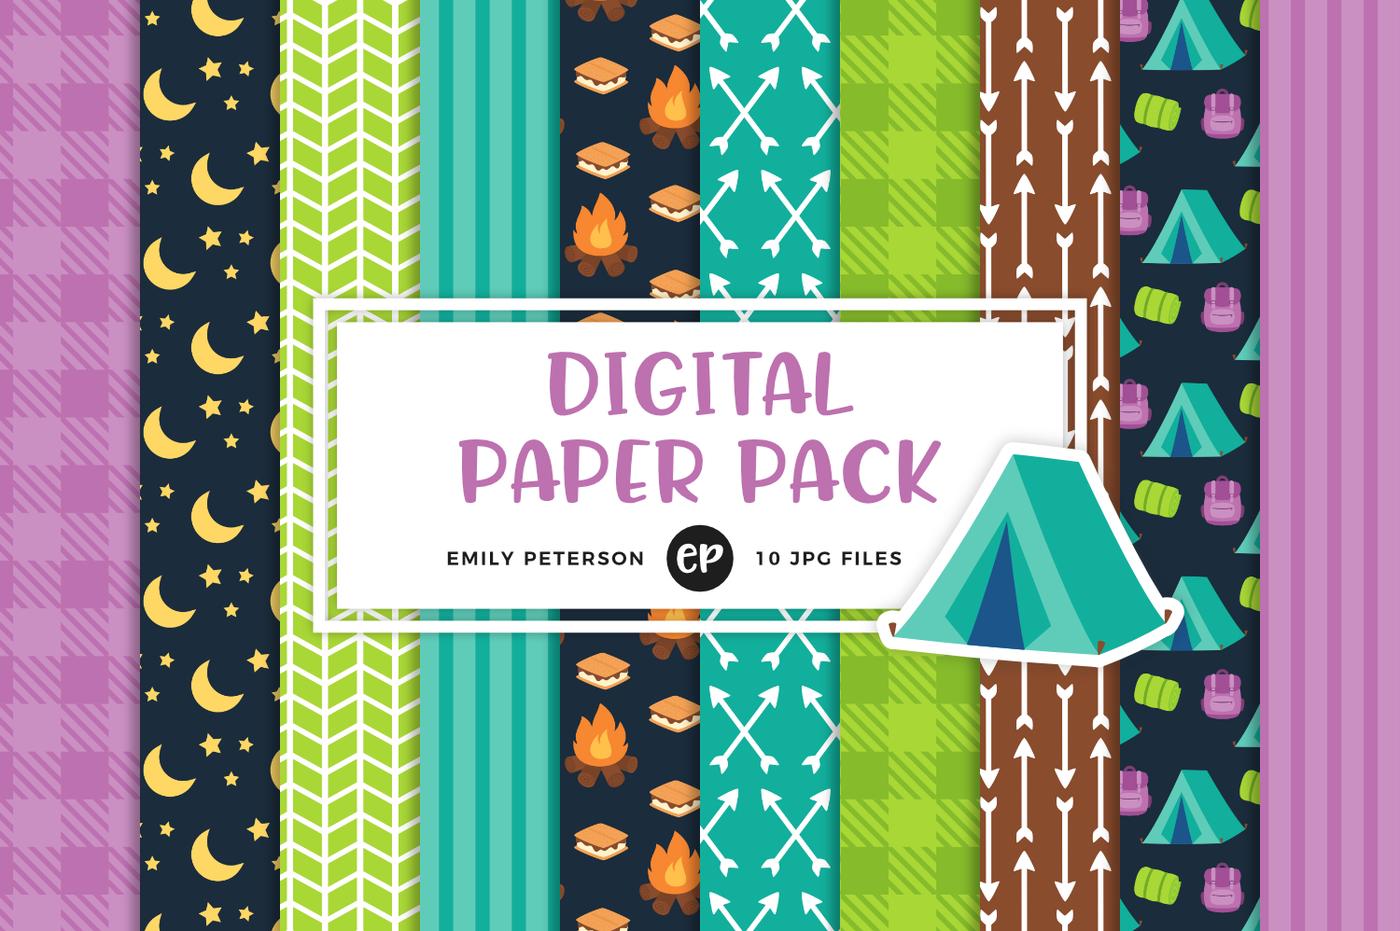 Summer clipart digital paper jpg download Summer Clipart/Digital Papers Bundle By Emily Peterson ... jpg download